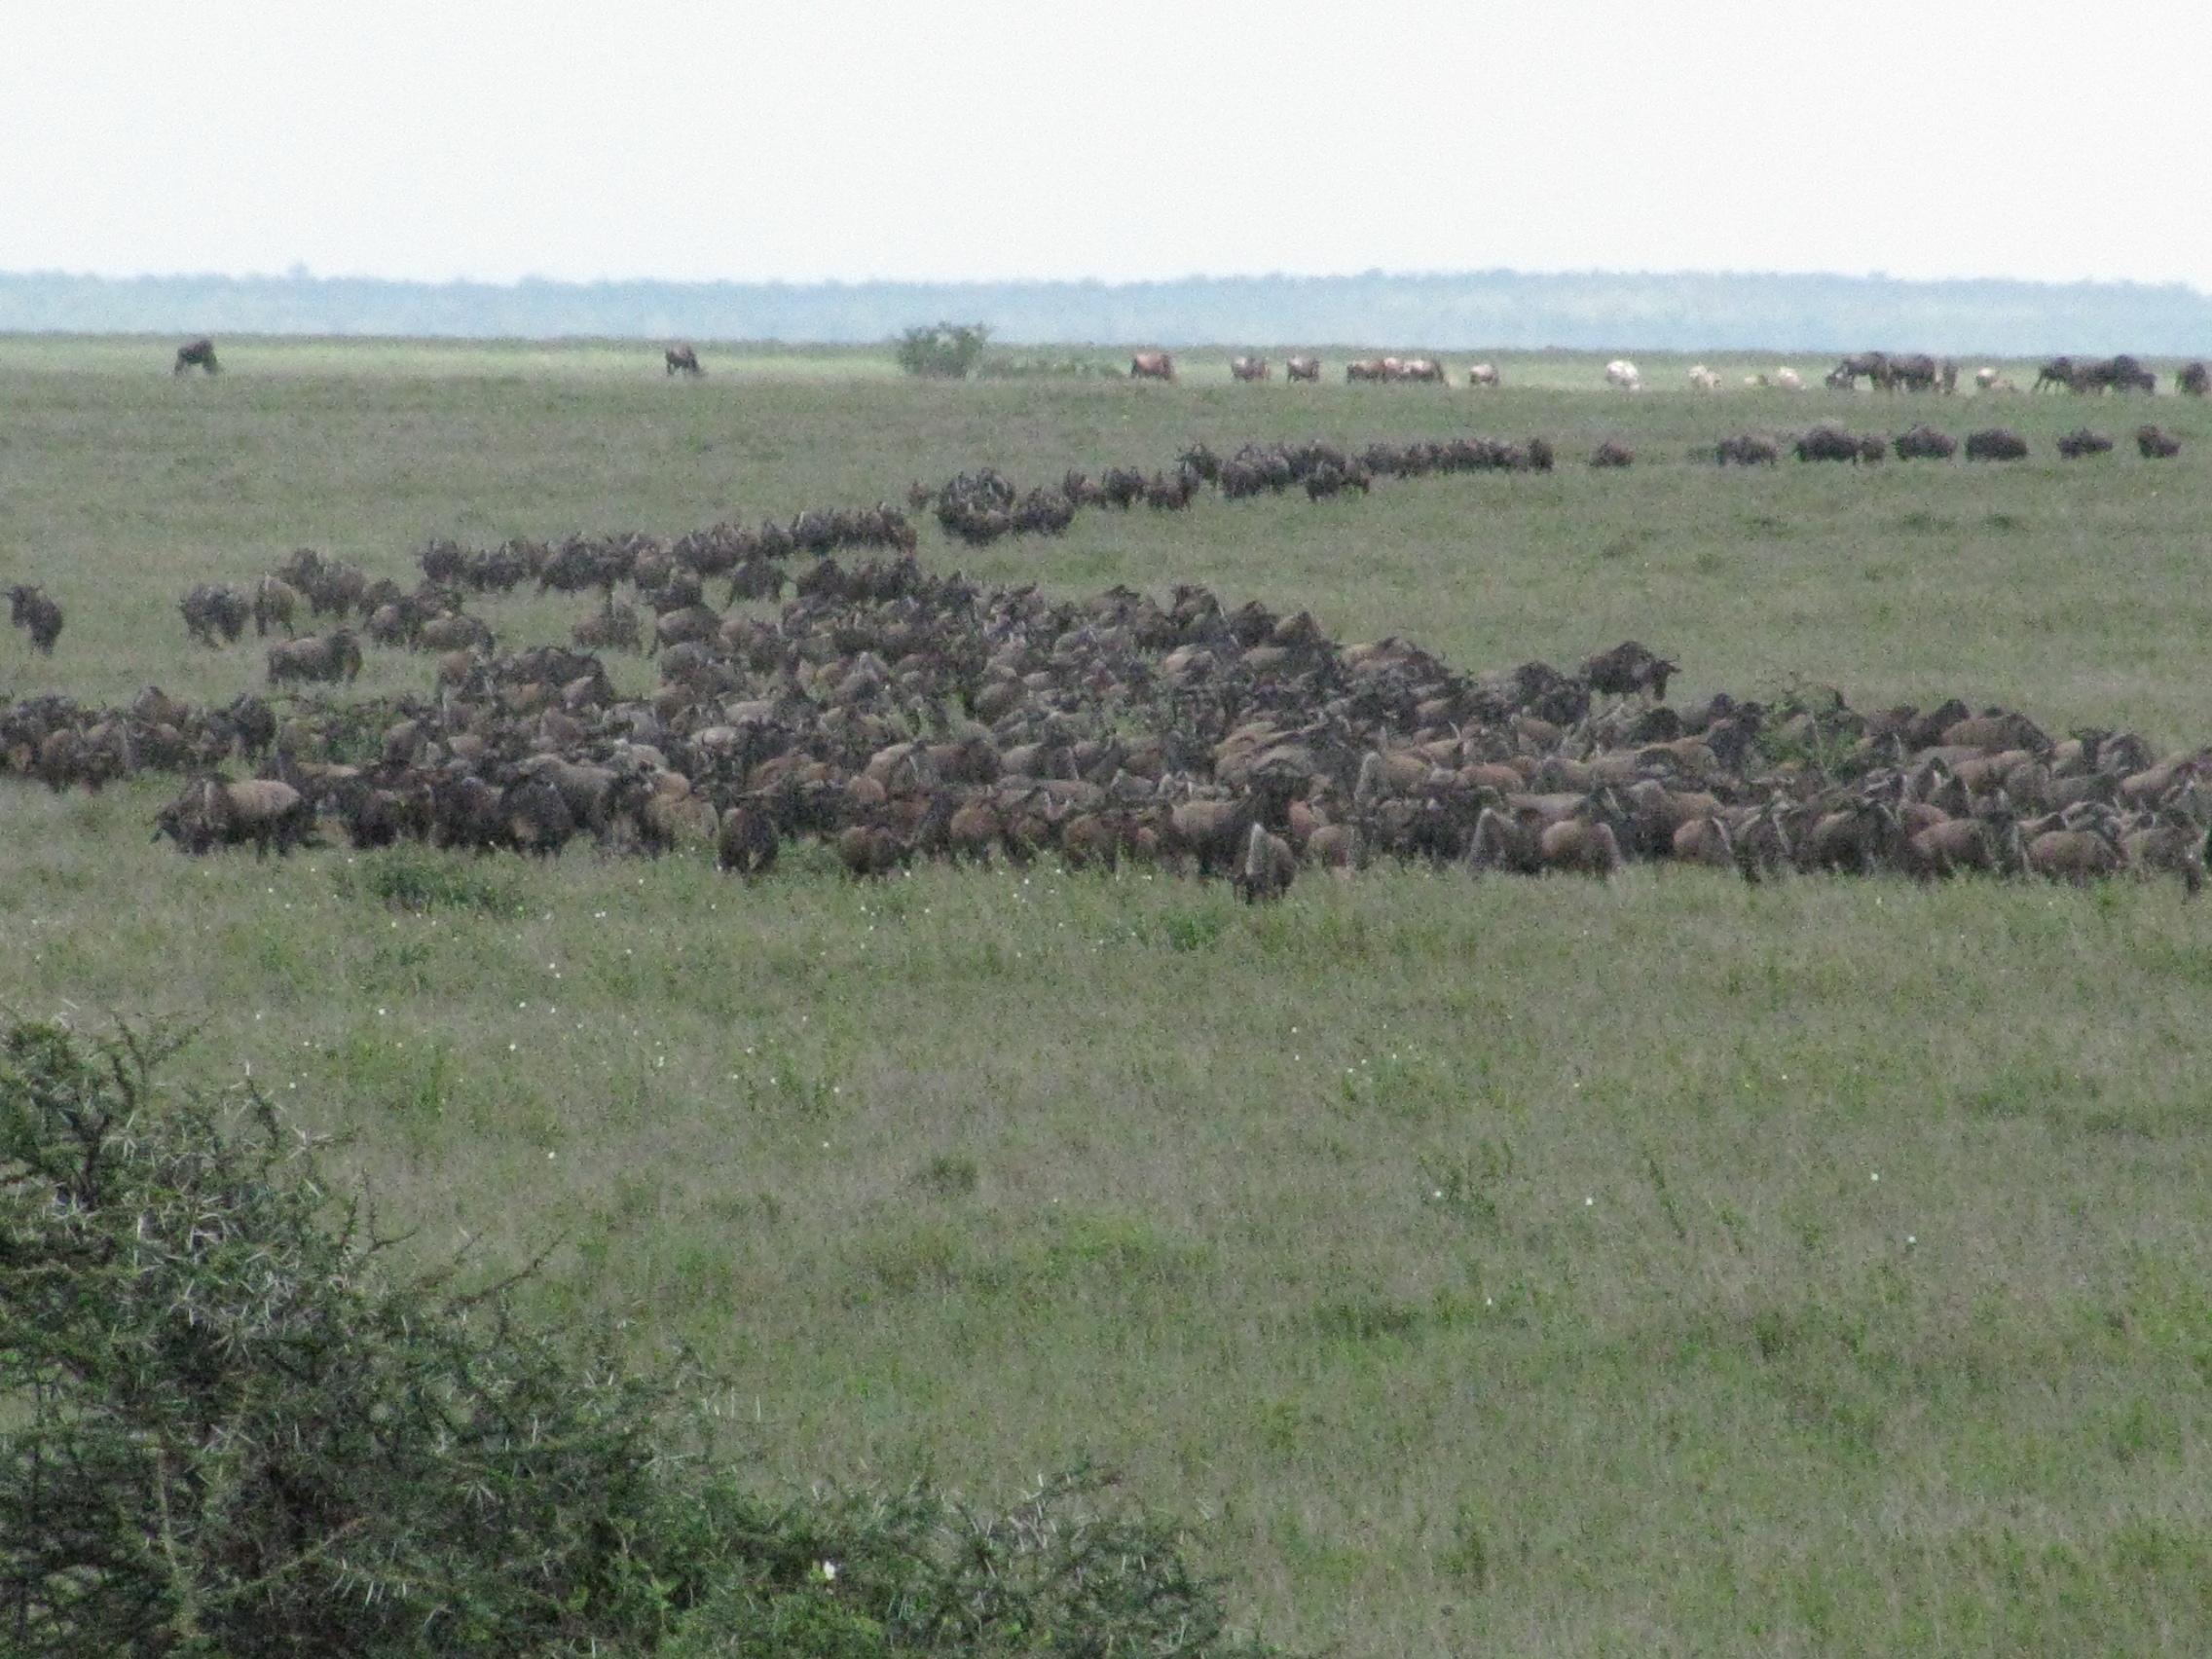 2008 Africa Tanzania wildebeest